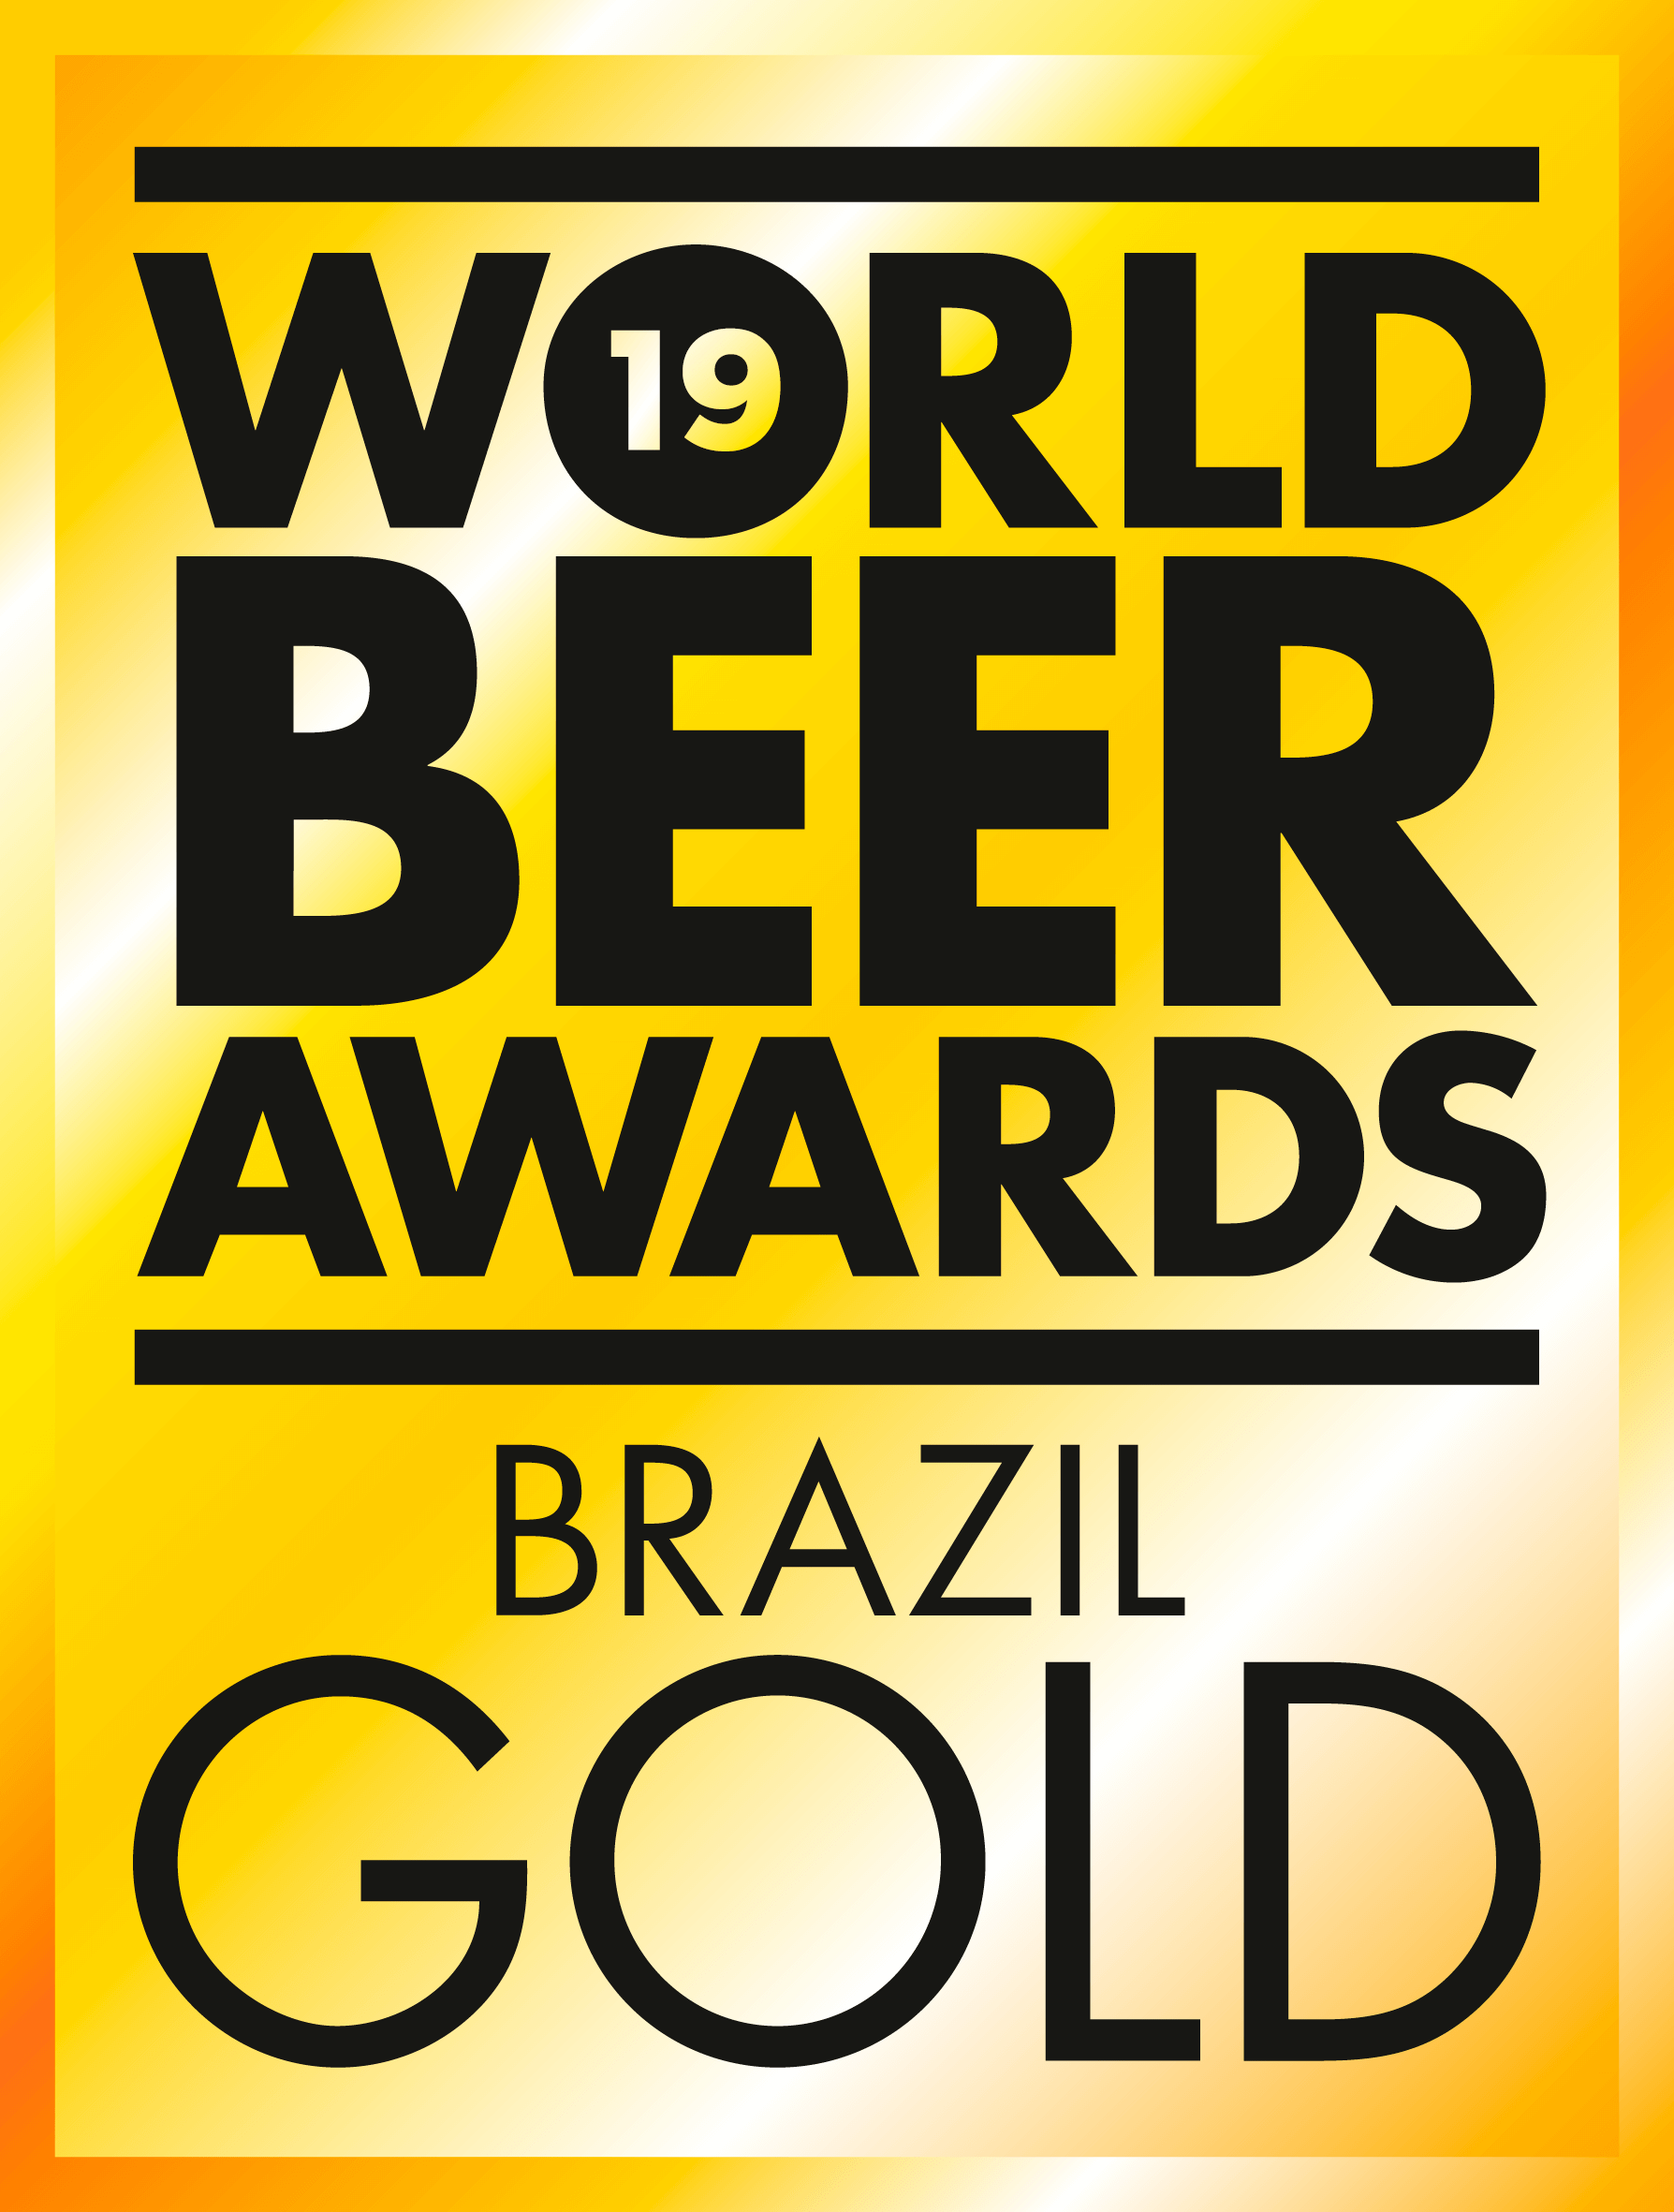 2019 World Beer Awards GOLD